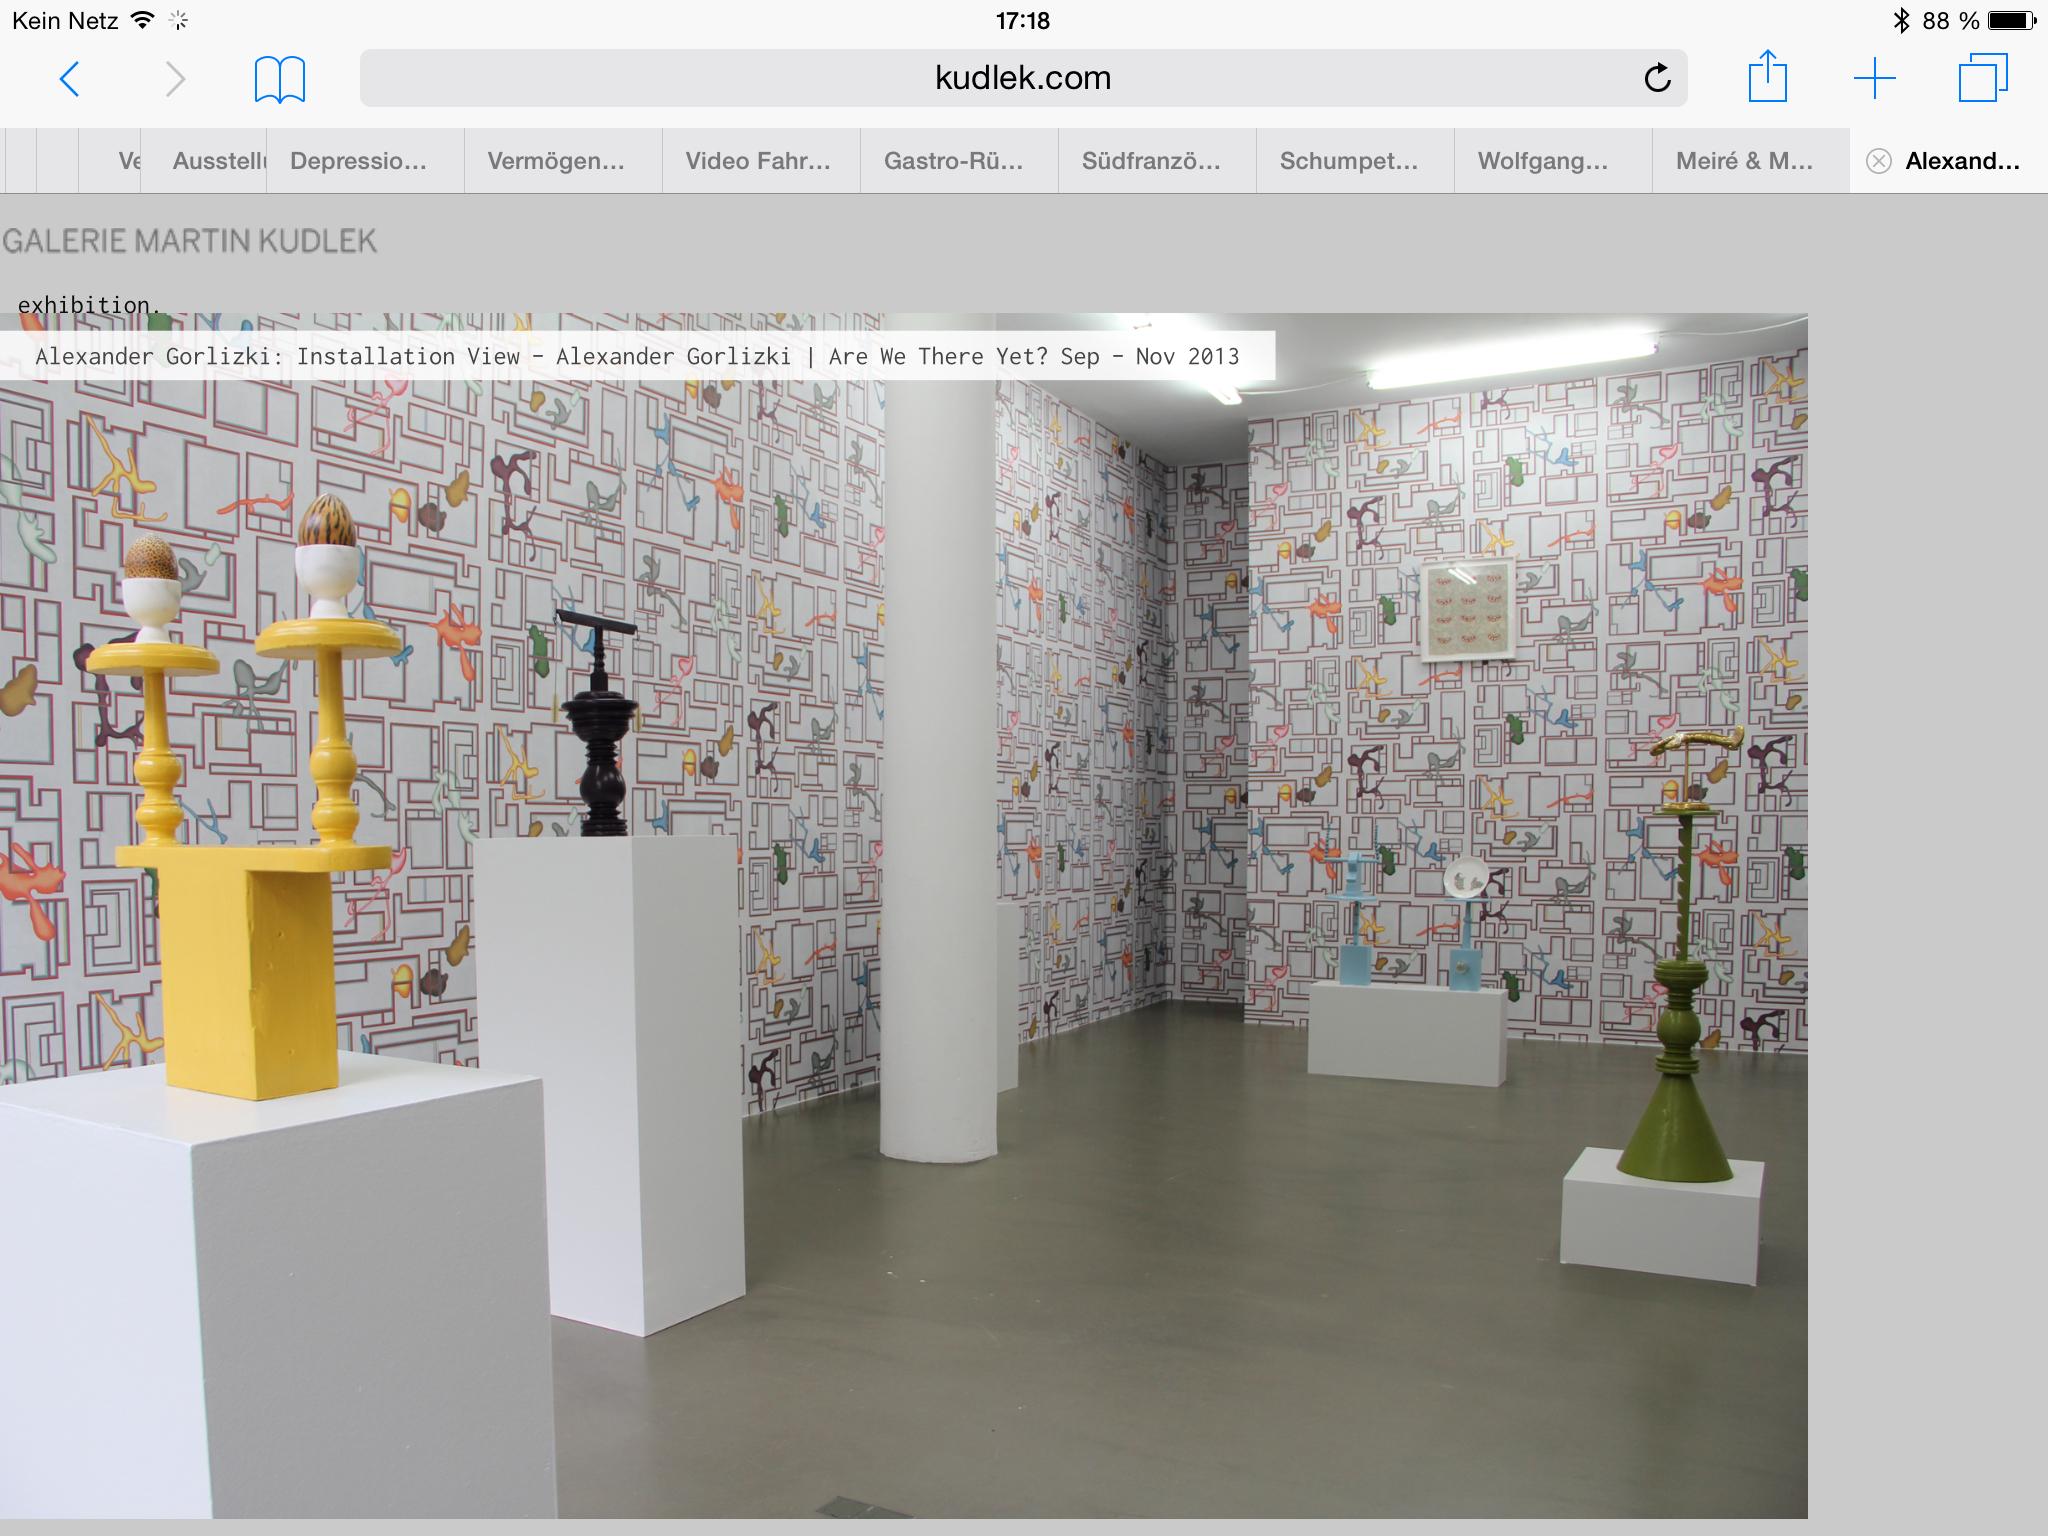 Martin Kudlek Gallery 2013